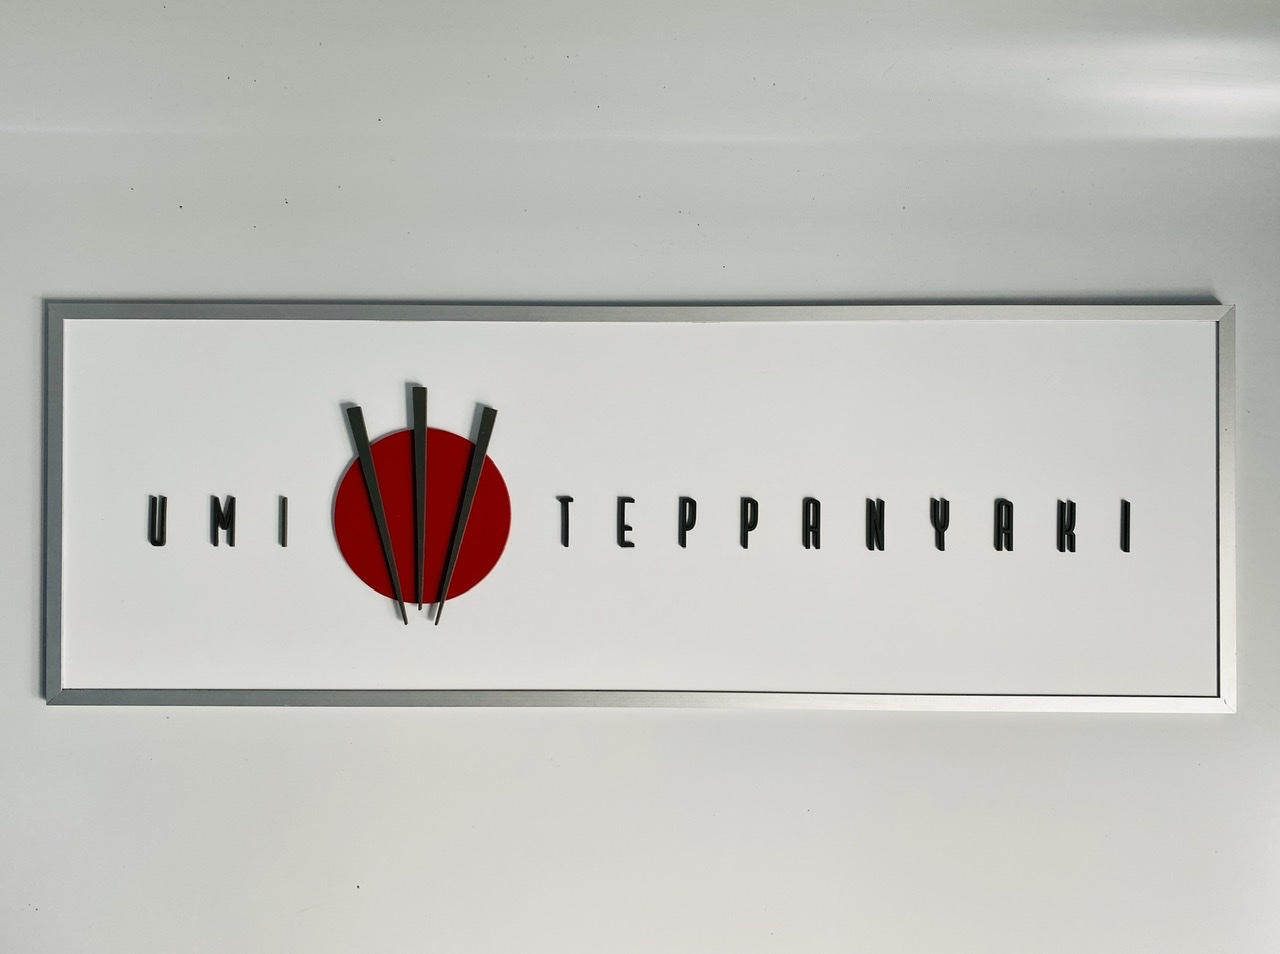 Umi Teppanyaki